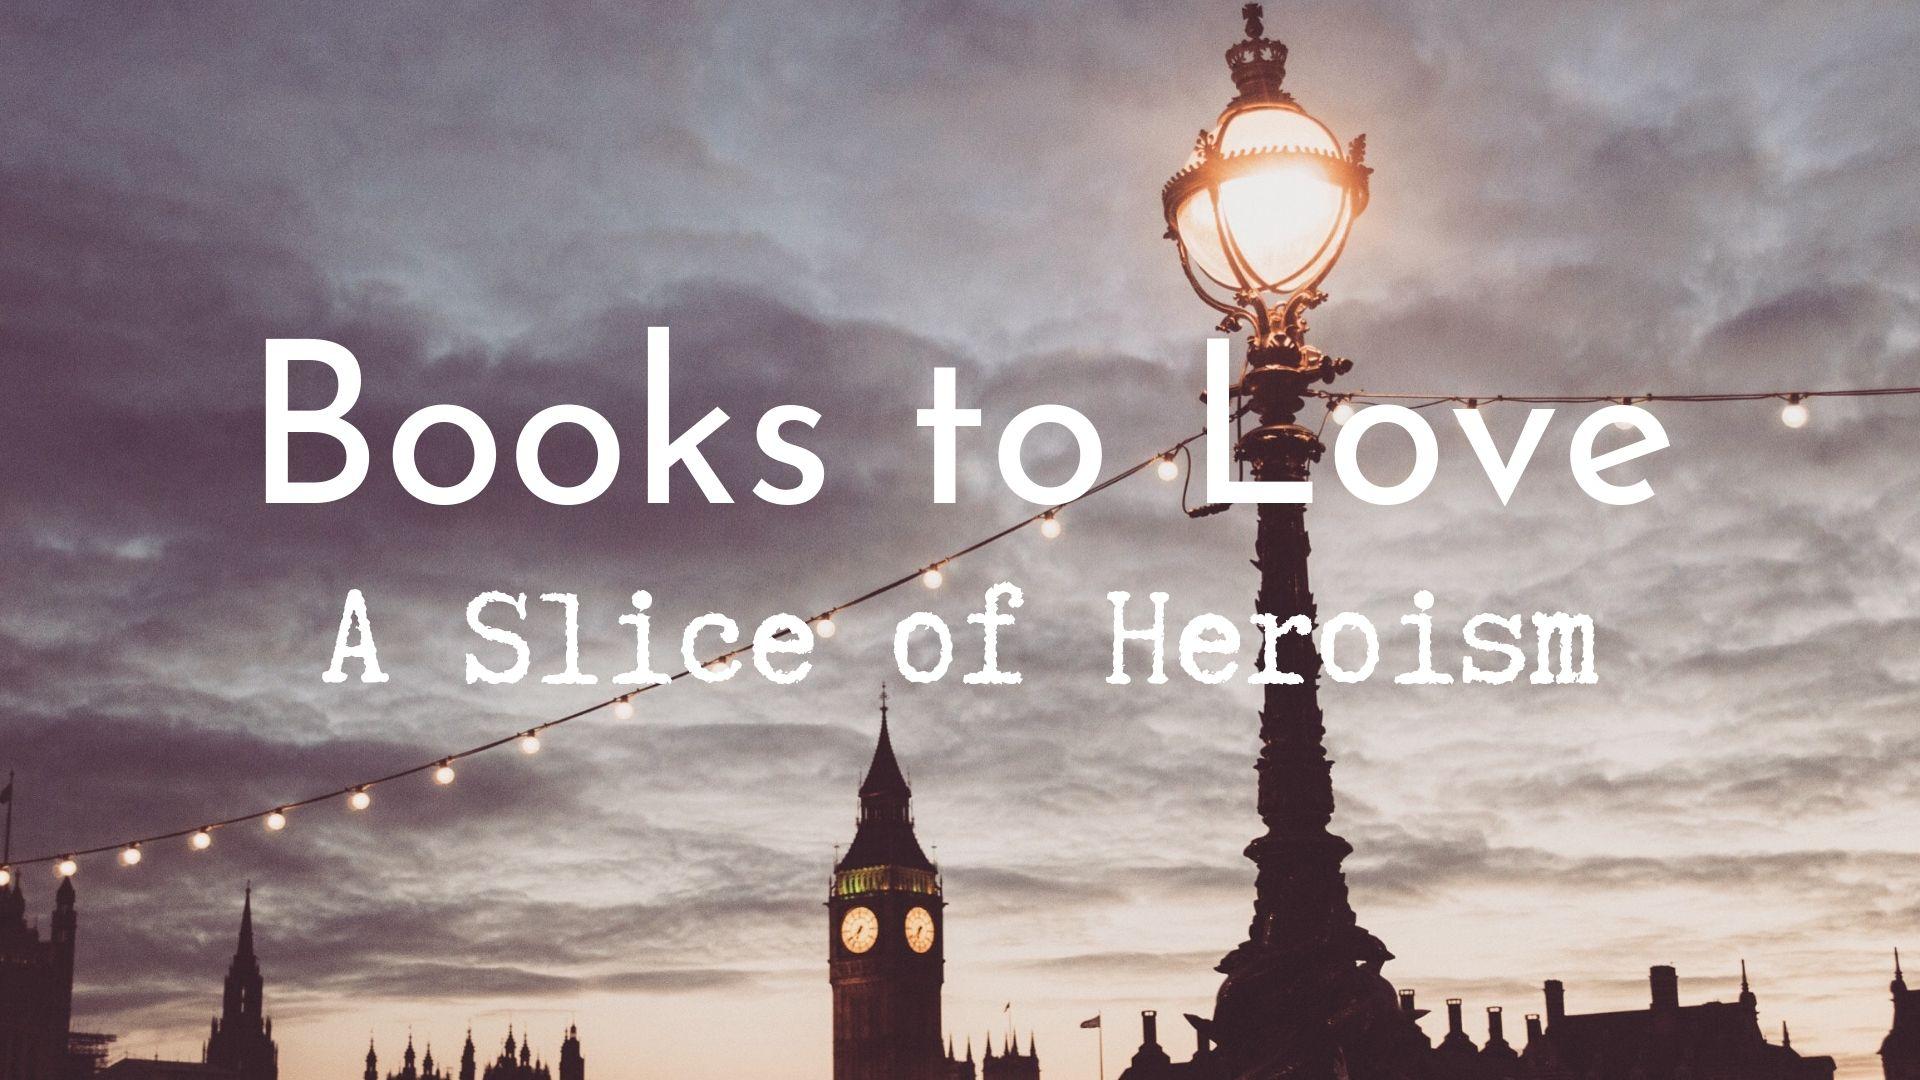 banner-books-to-love-a-slice-of-heroism-01.jpg